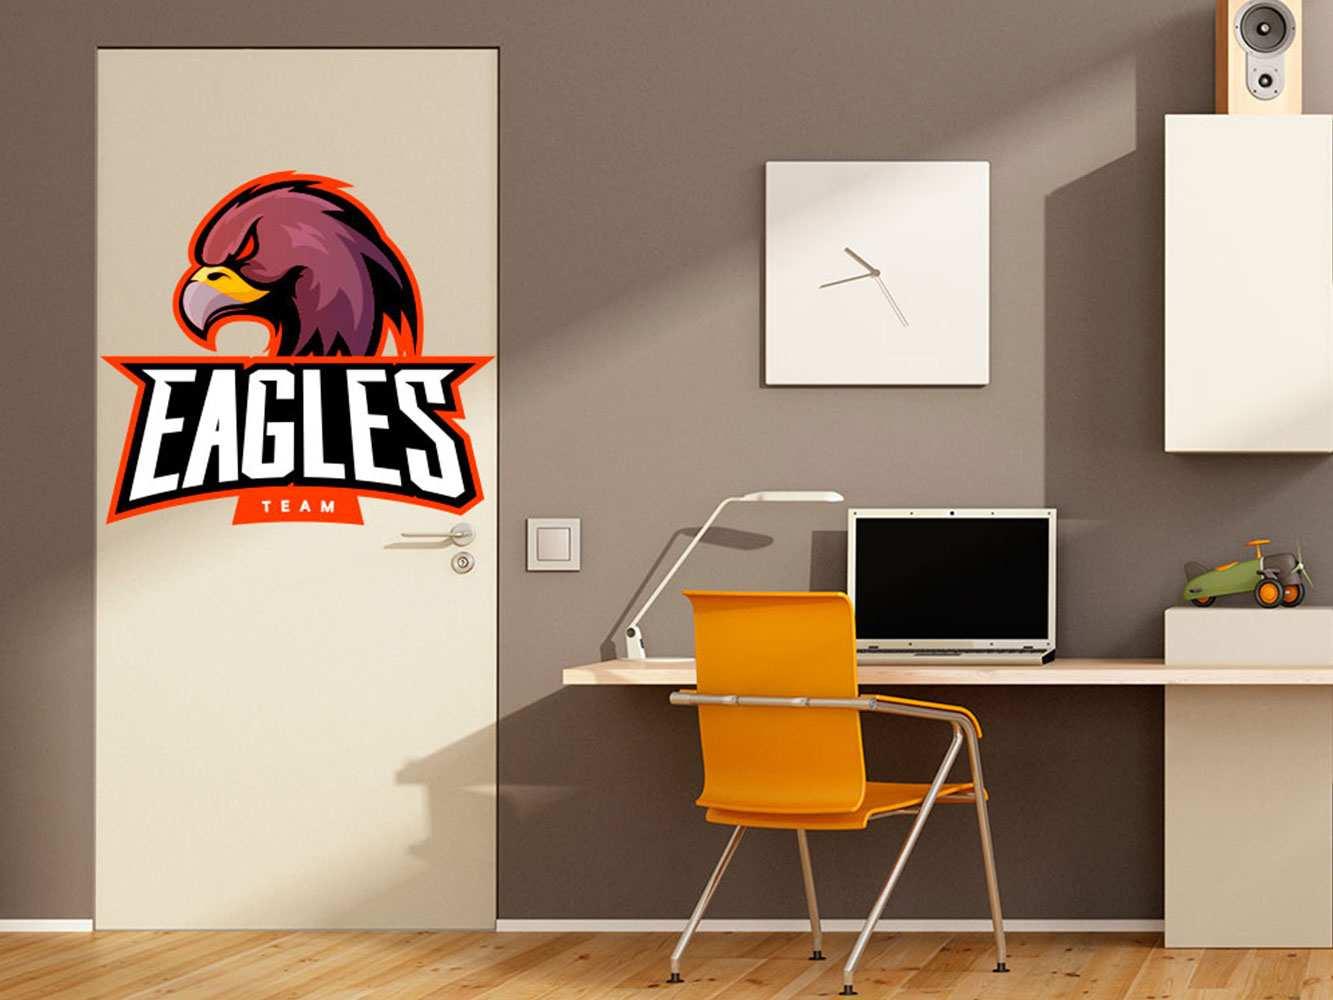 Vinilo Decorativo Puerta Eagles Team | Carteles XXL - Impresión carteleria publicitaria